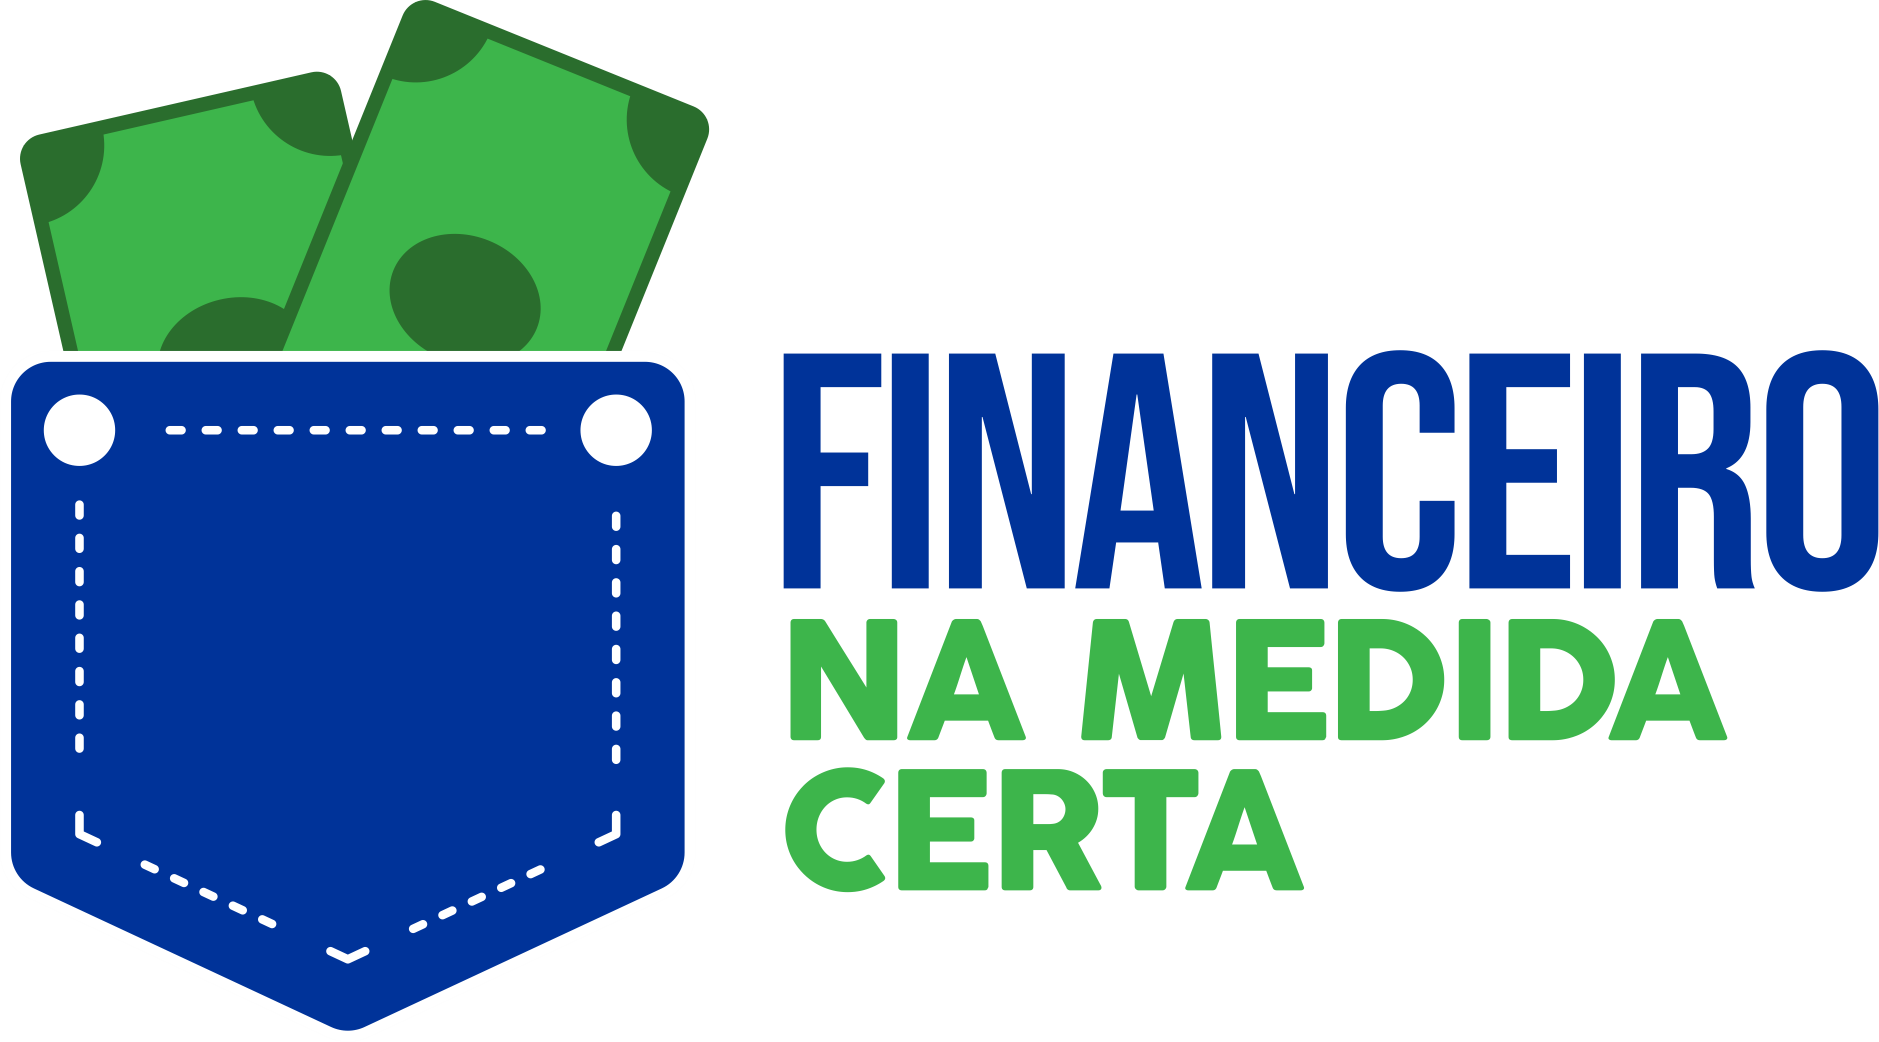 Financeiro na medida